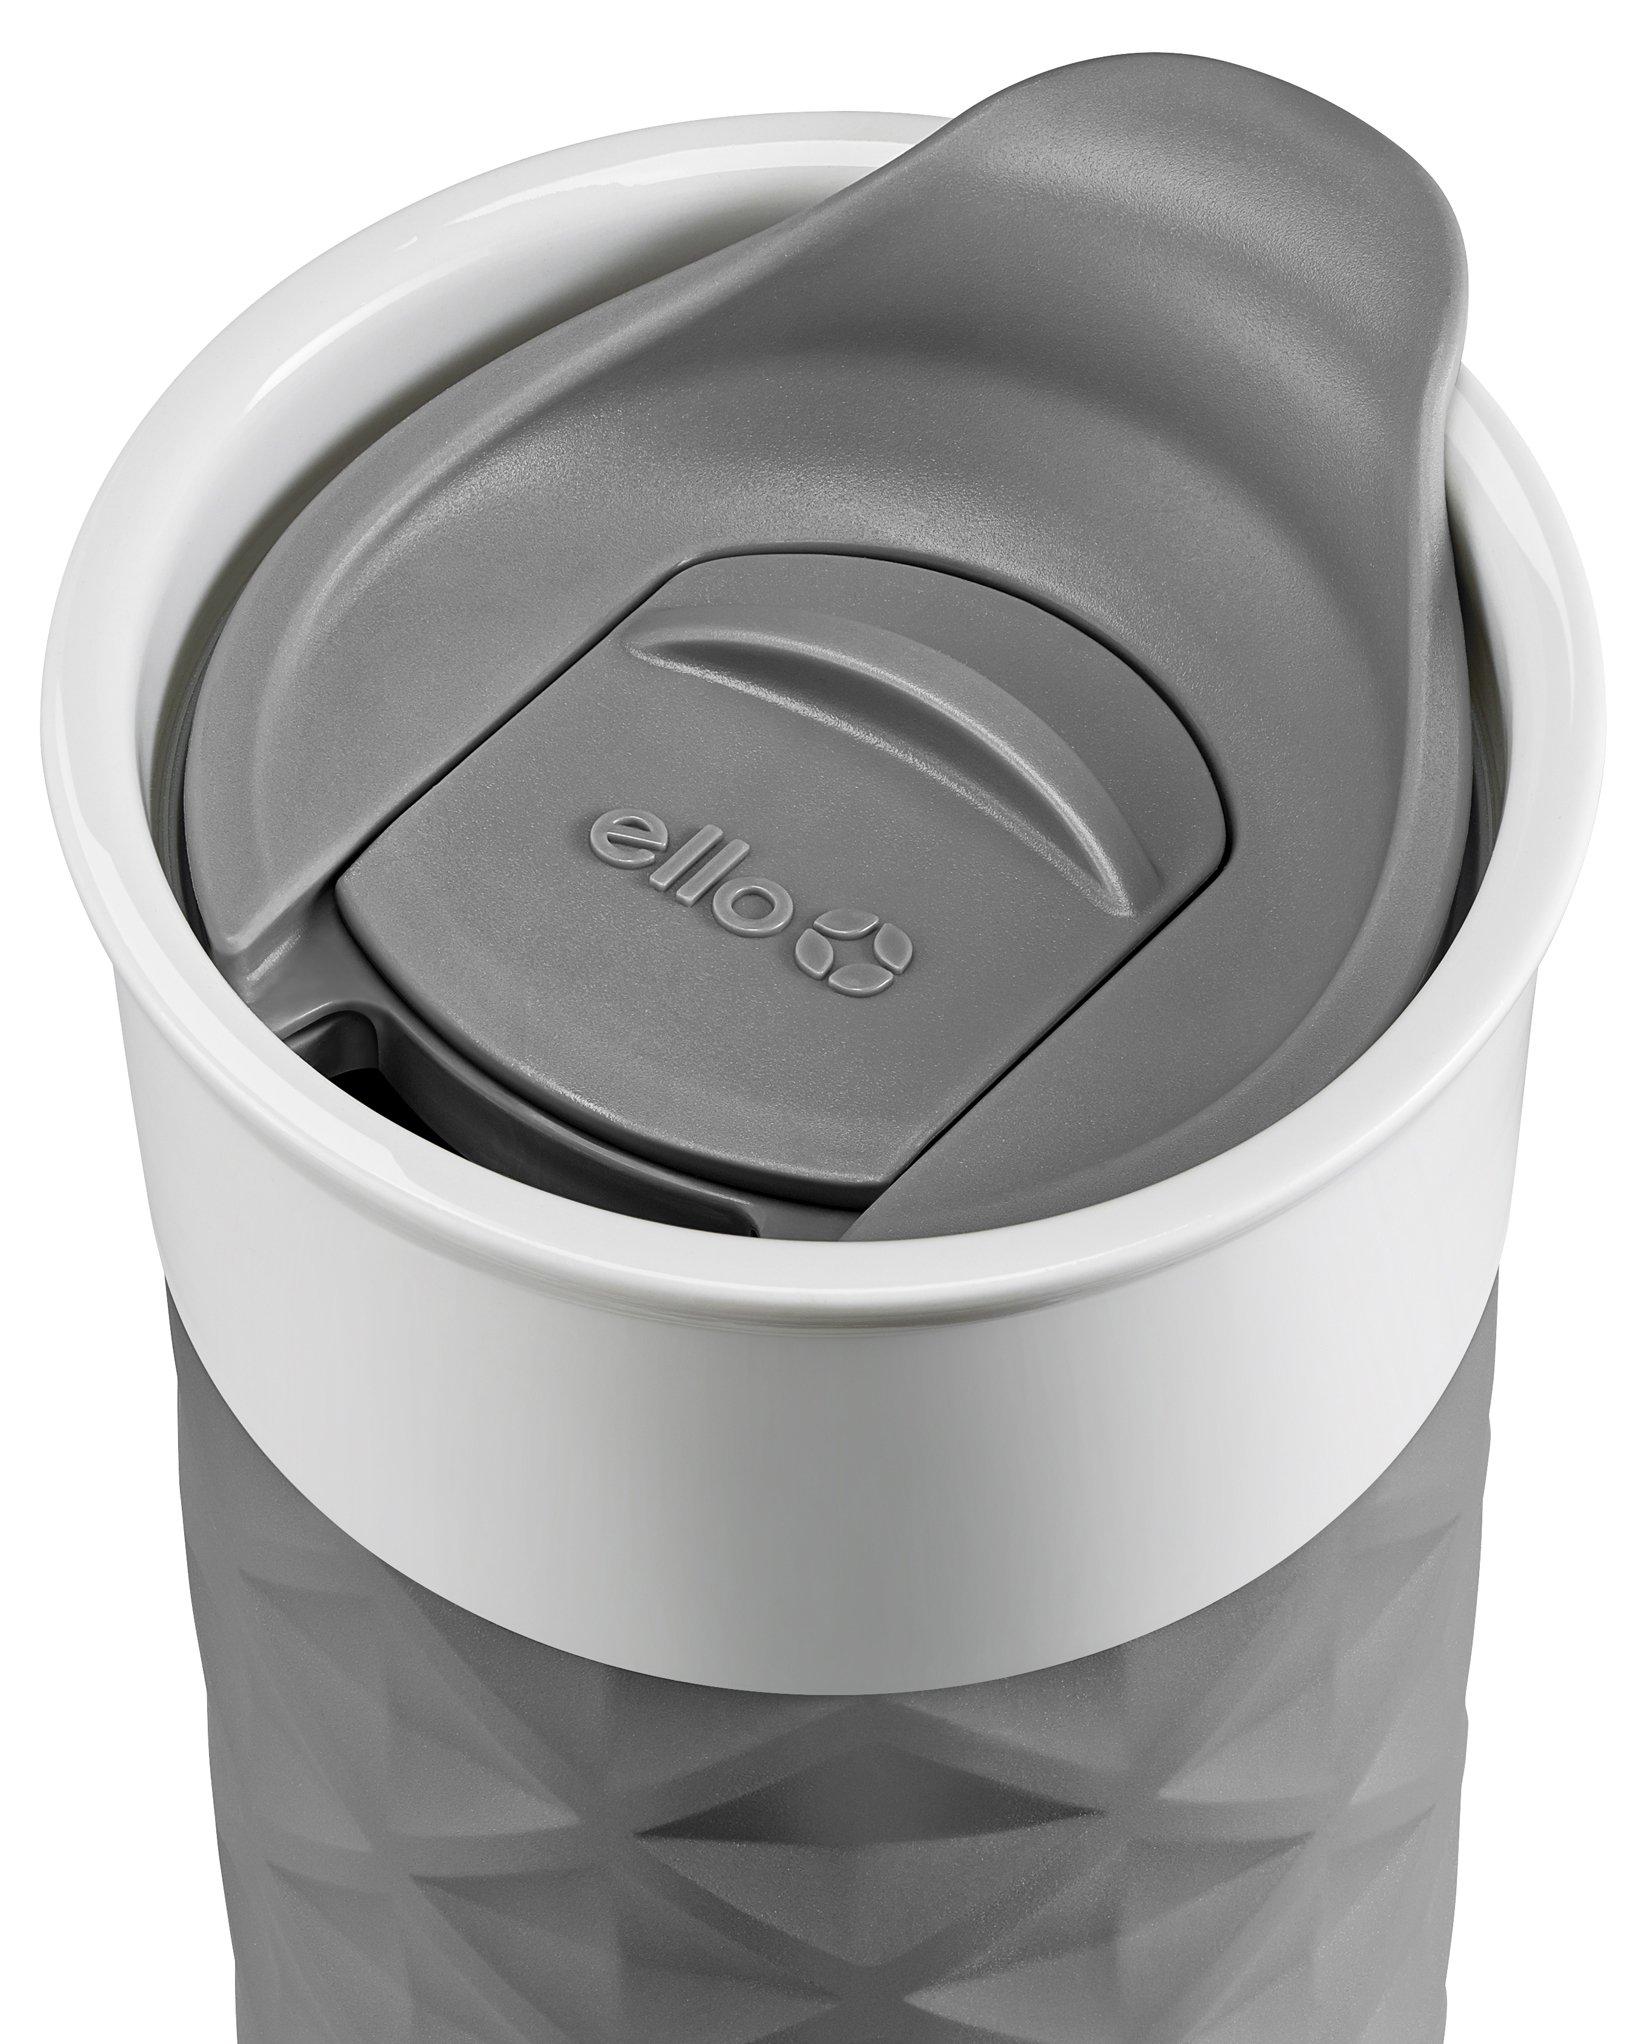 Ello Ogden BPA-Free Ceramic Travel Mug with Lid, Grey, 16 oz by Ello (Image #2)